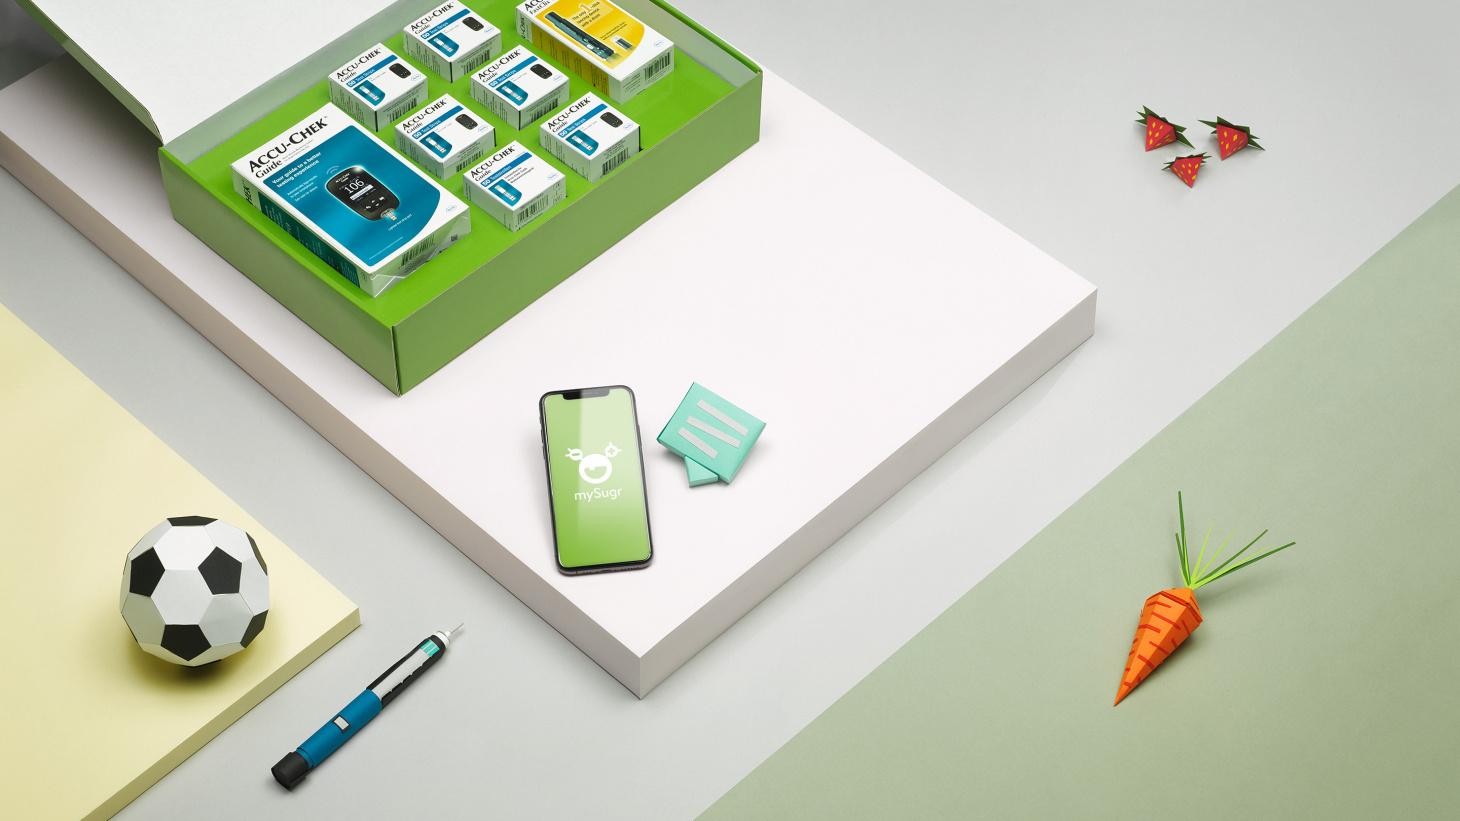 mySugr bunde and the mySugr diabetes app